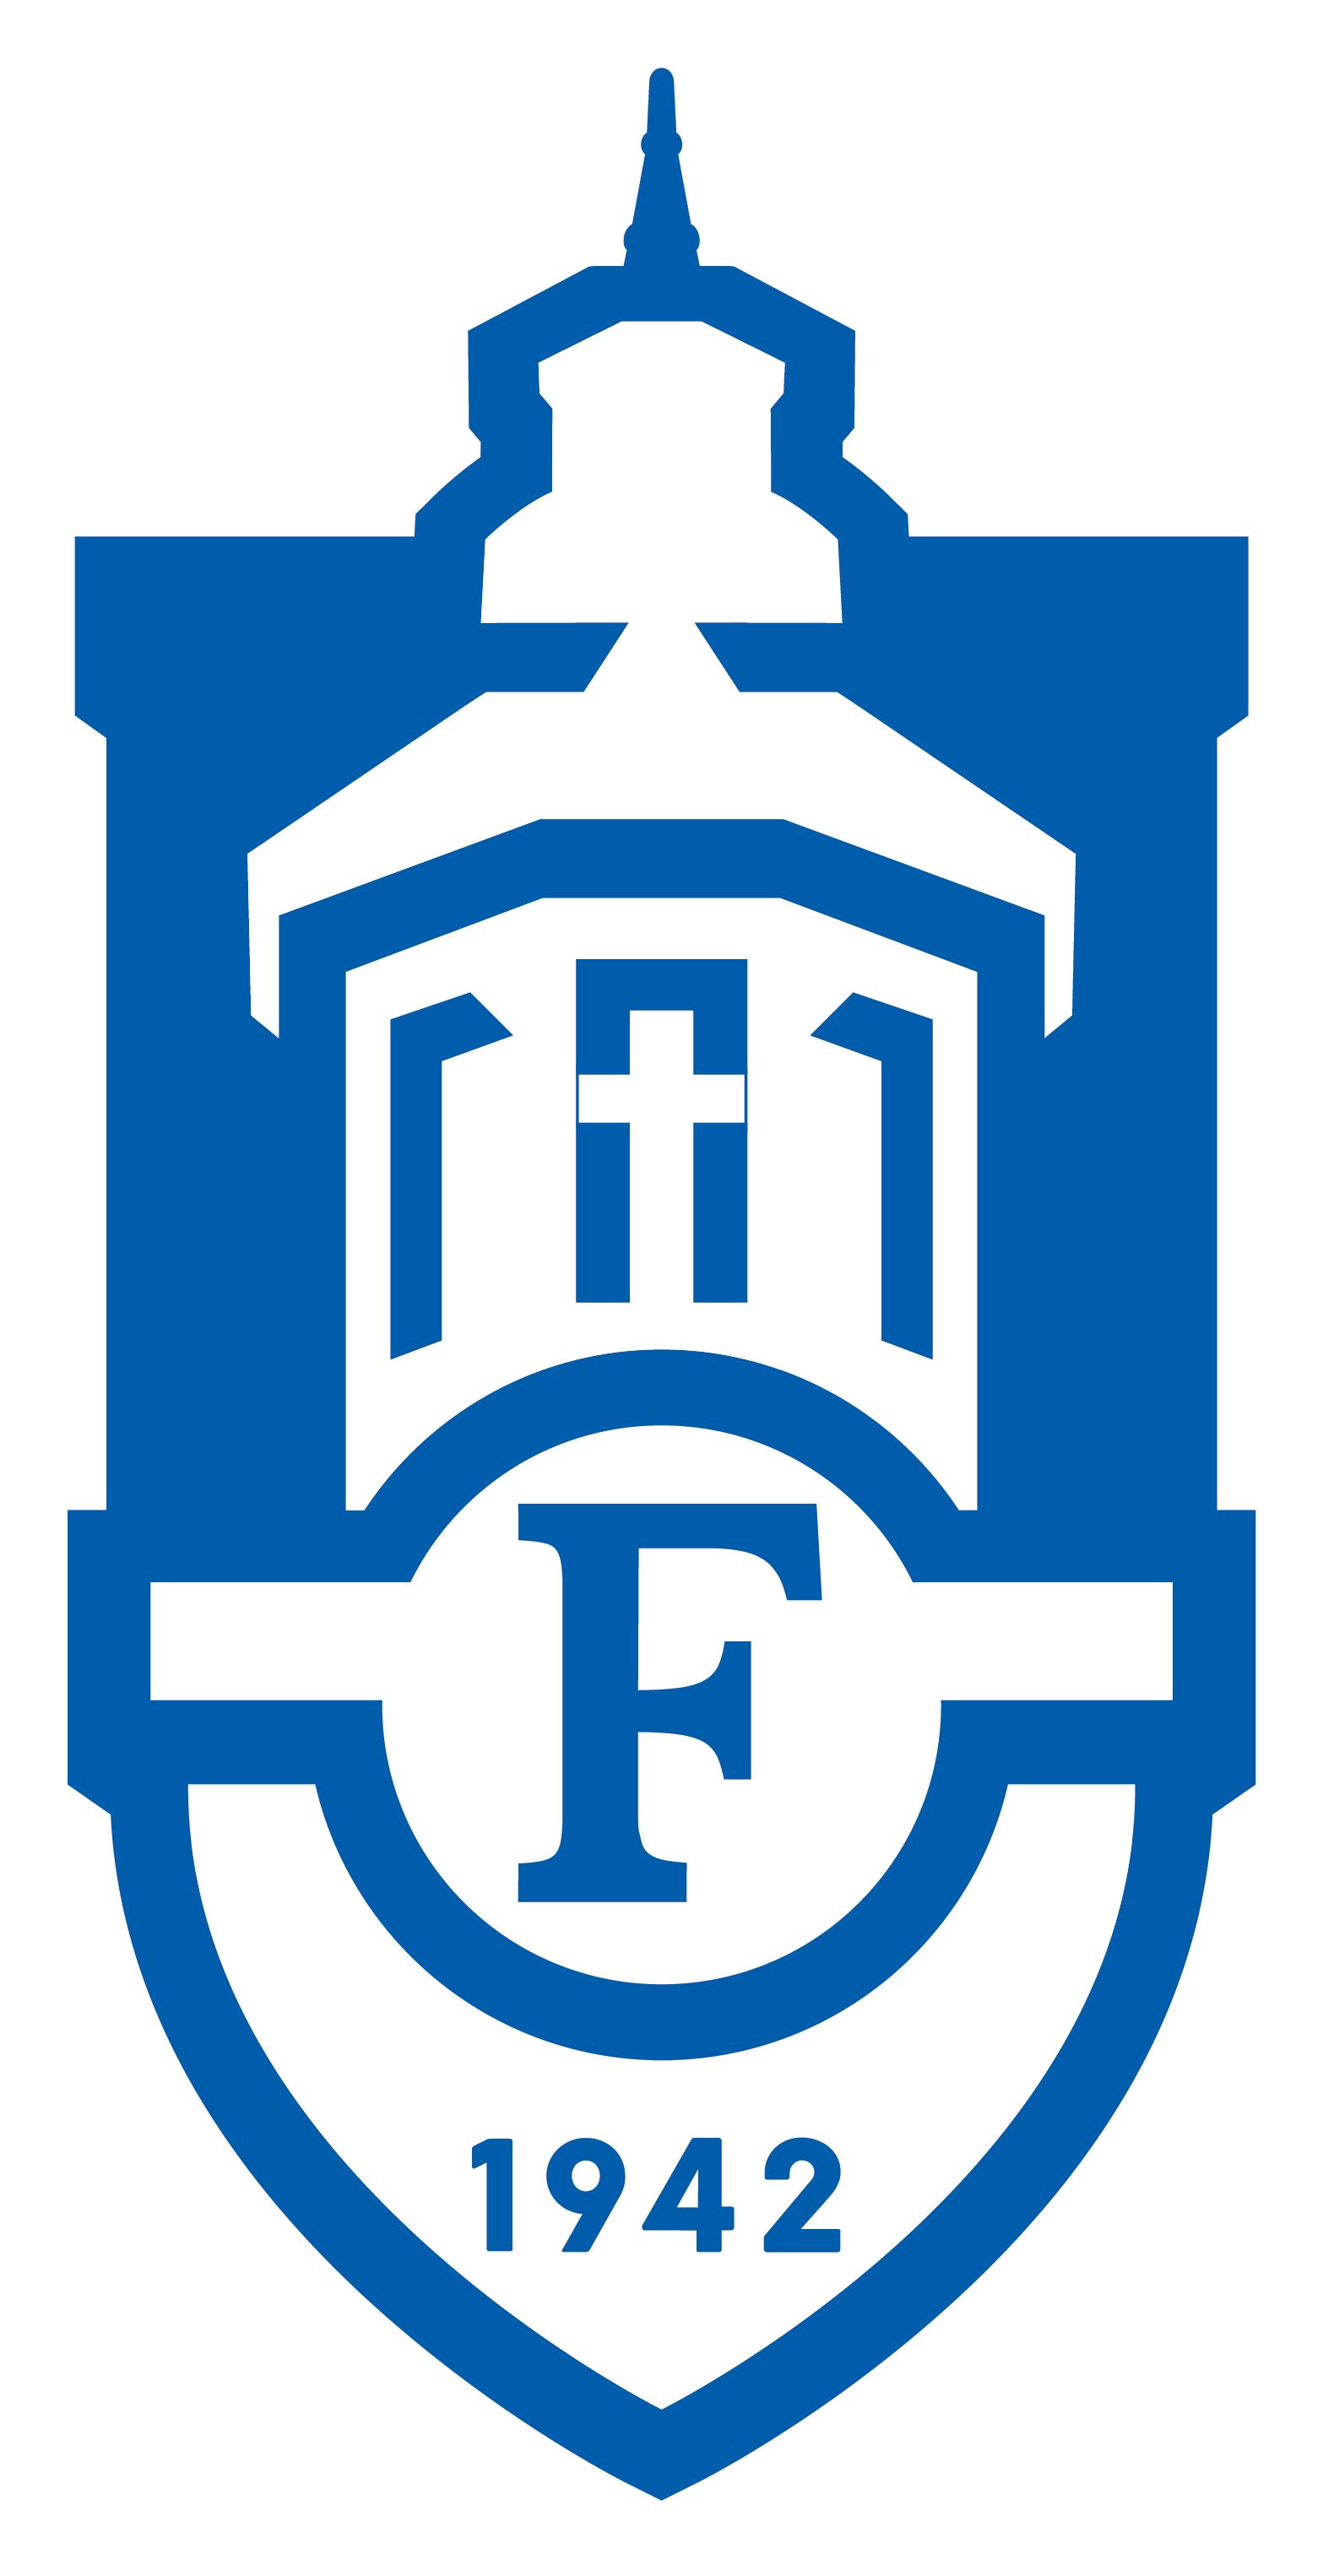 Logo Crest Monochrome